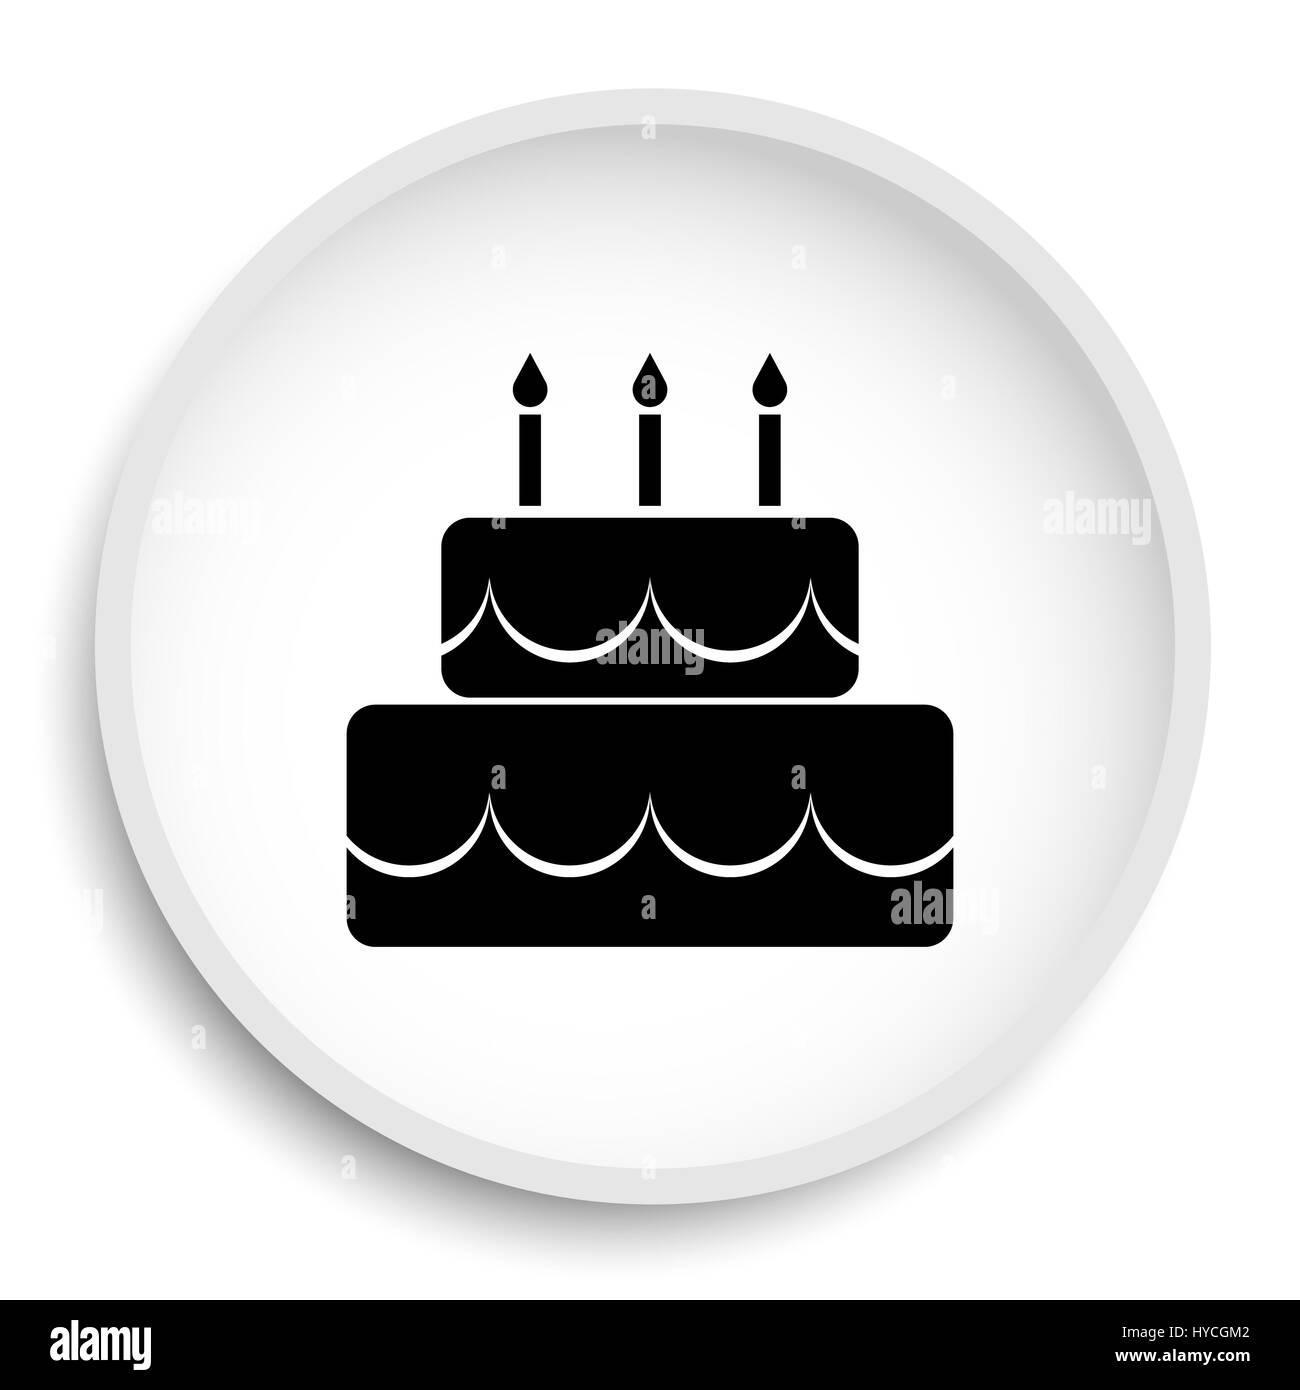 Cake icon cake website button on white background stock photo cake icon cake website button on white background buycottarizona